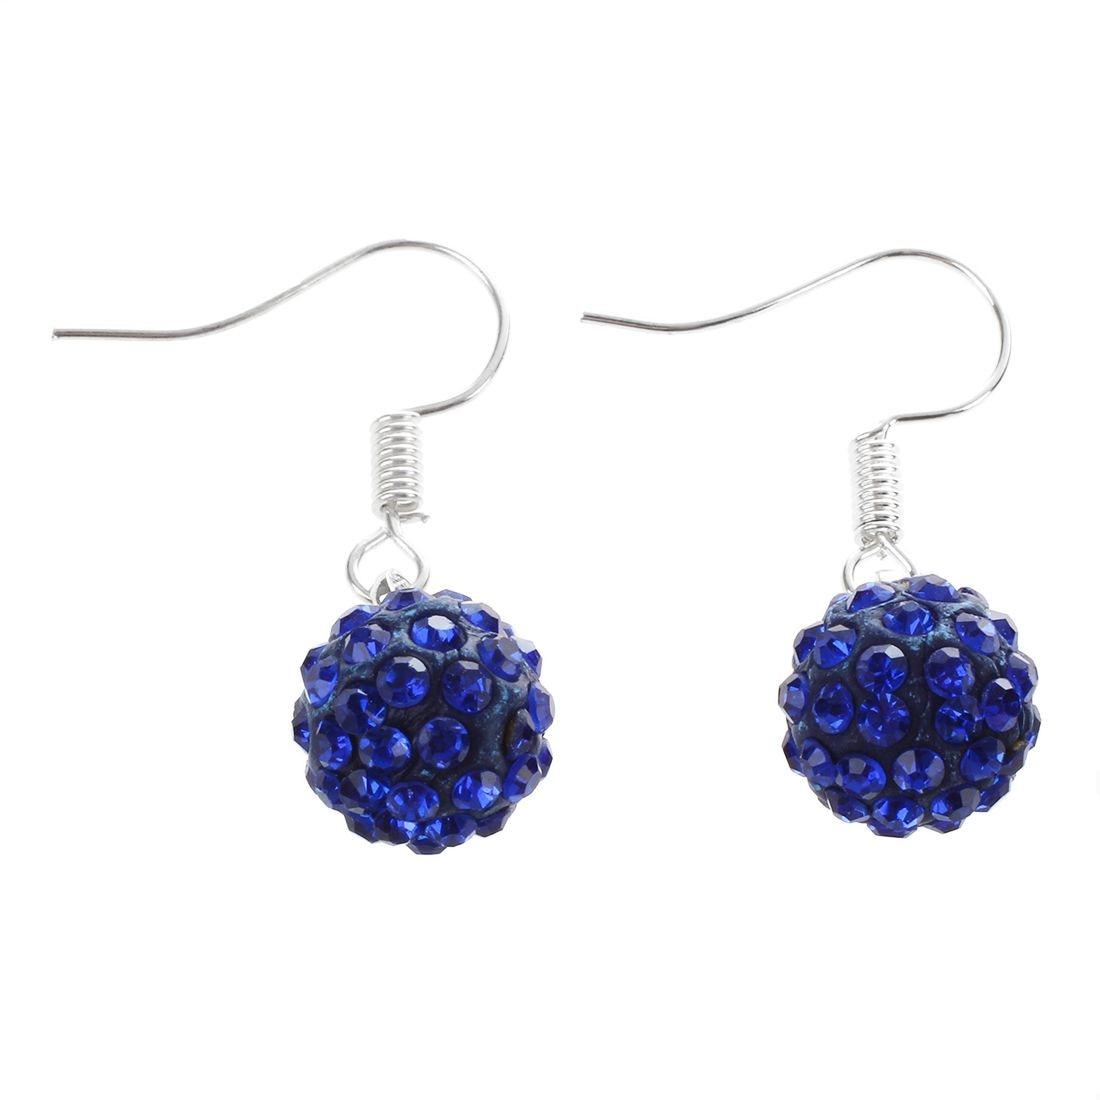 Shamballa Style Crystal Earrings - Navy Blue